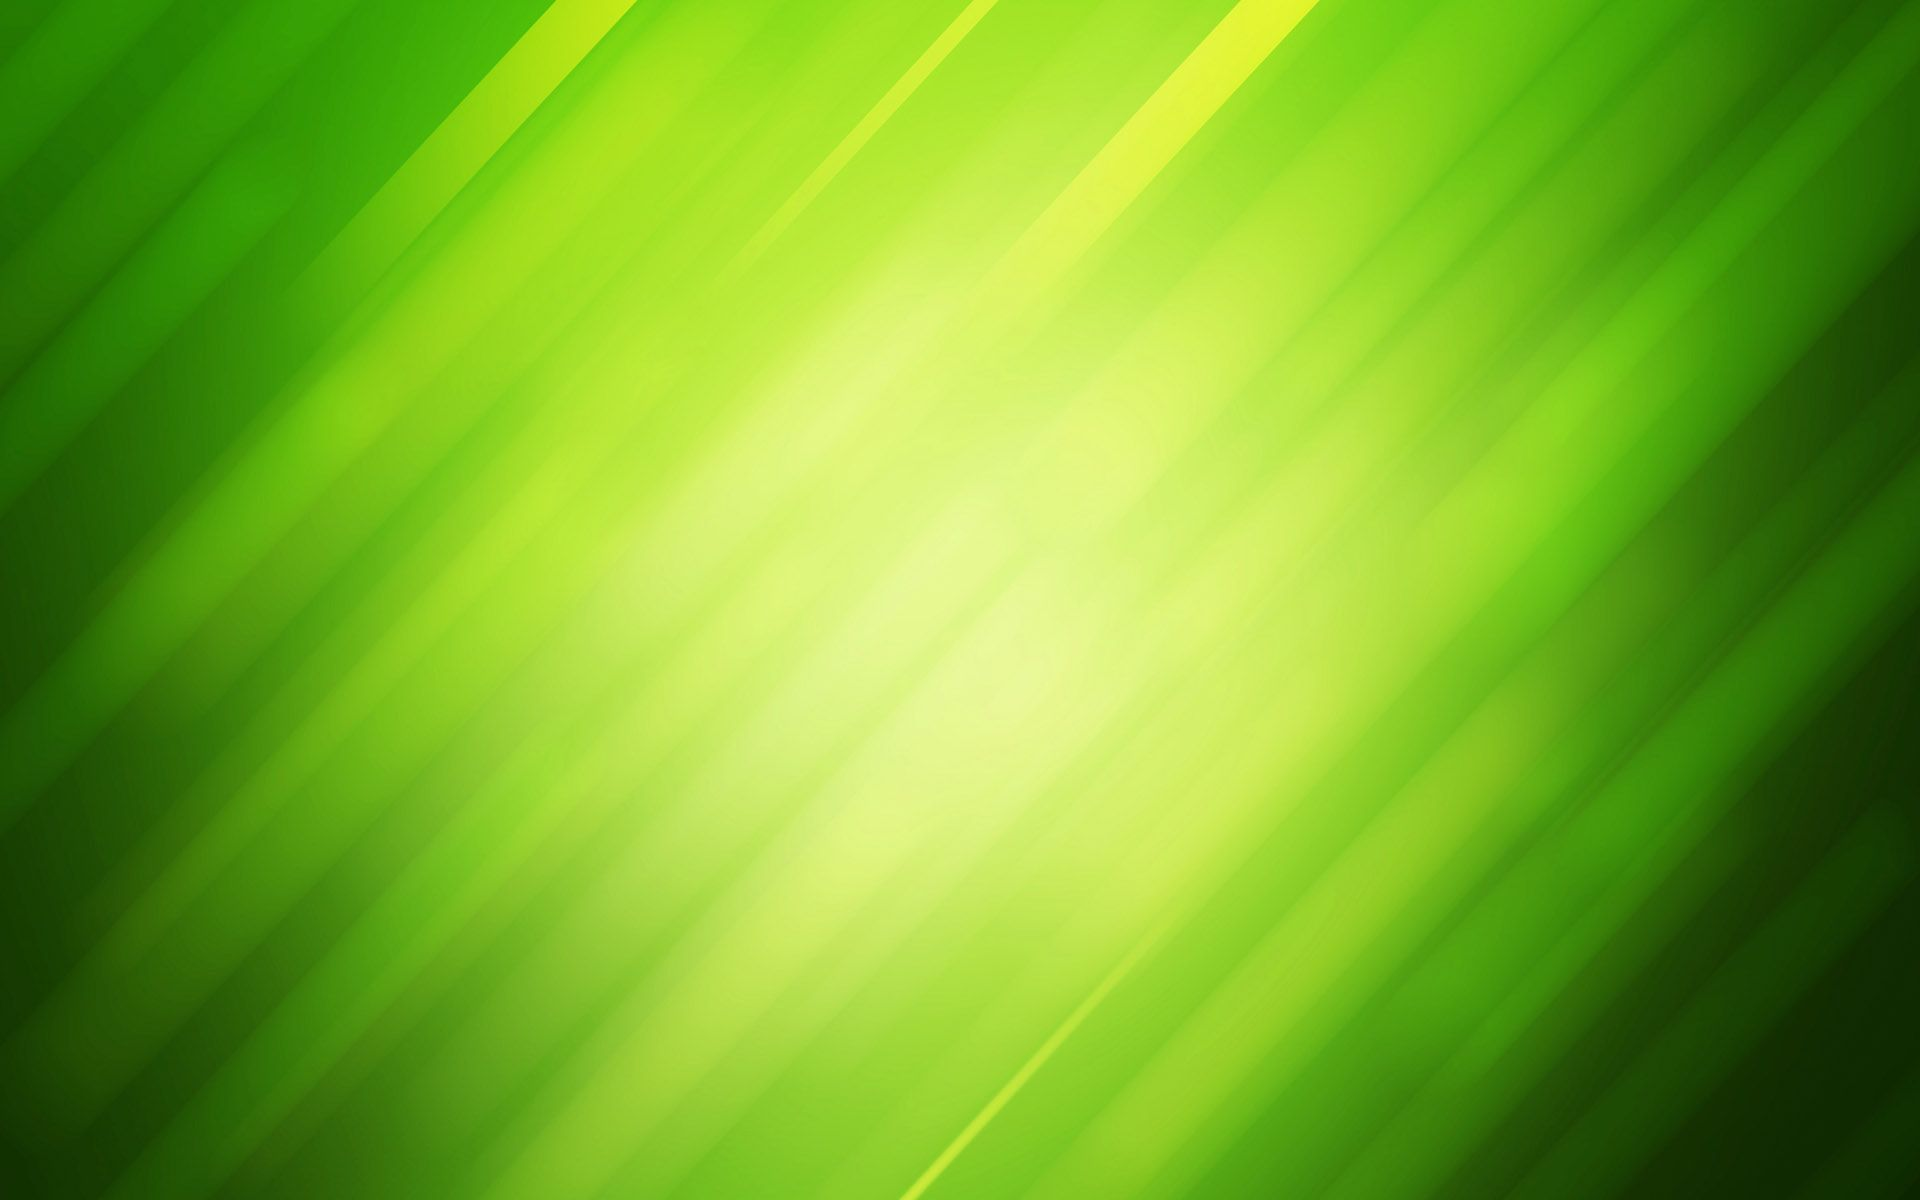 Inspirational Iphone Wallpaper Abstract Green Hd Background Wallpaper Nature